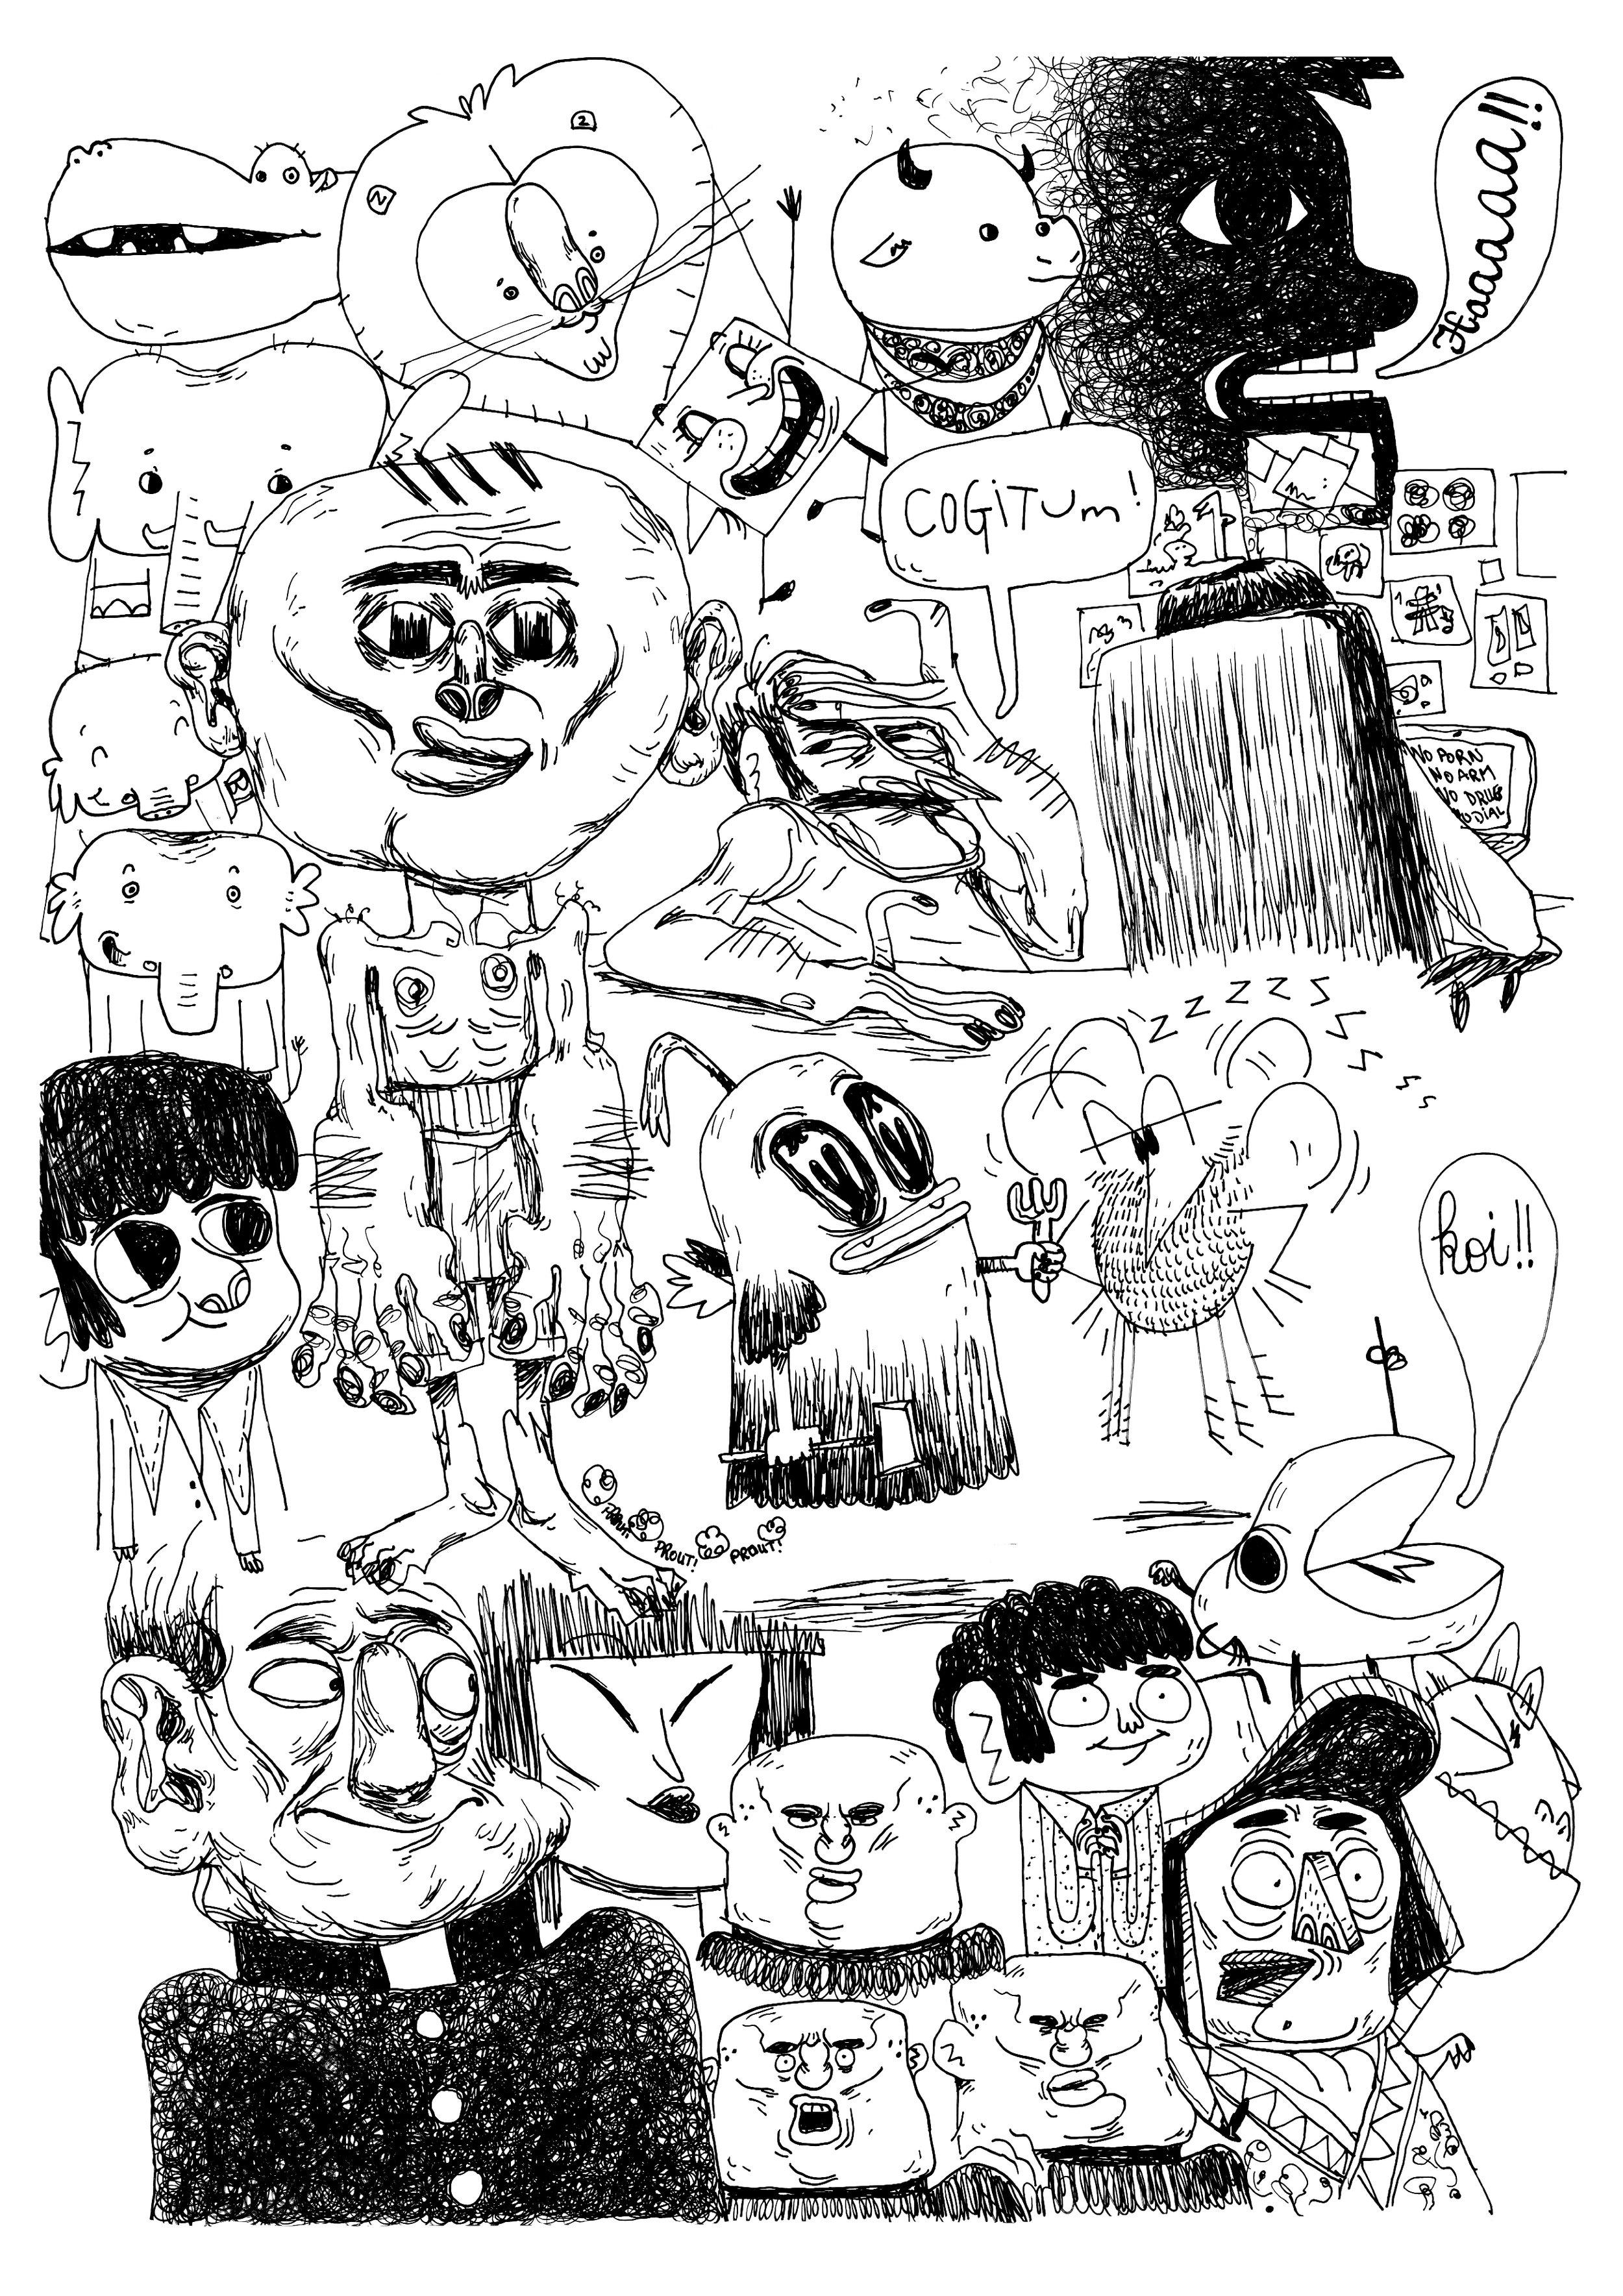 Pascal_Zaffiro_Doodle_40.jpg